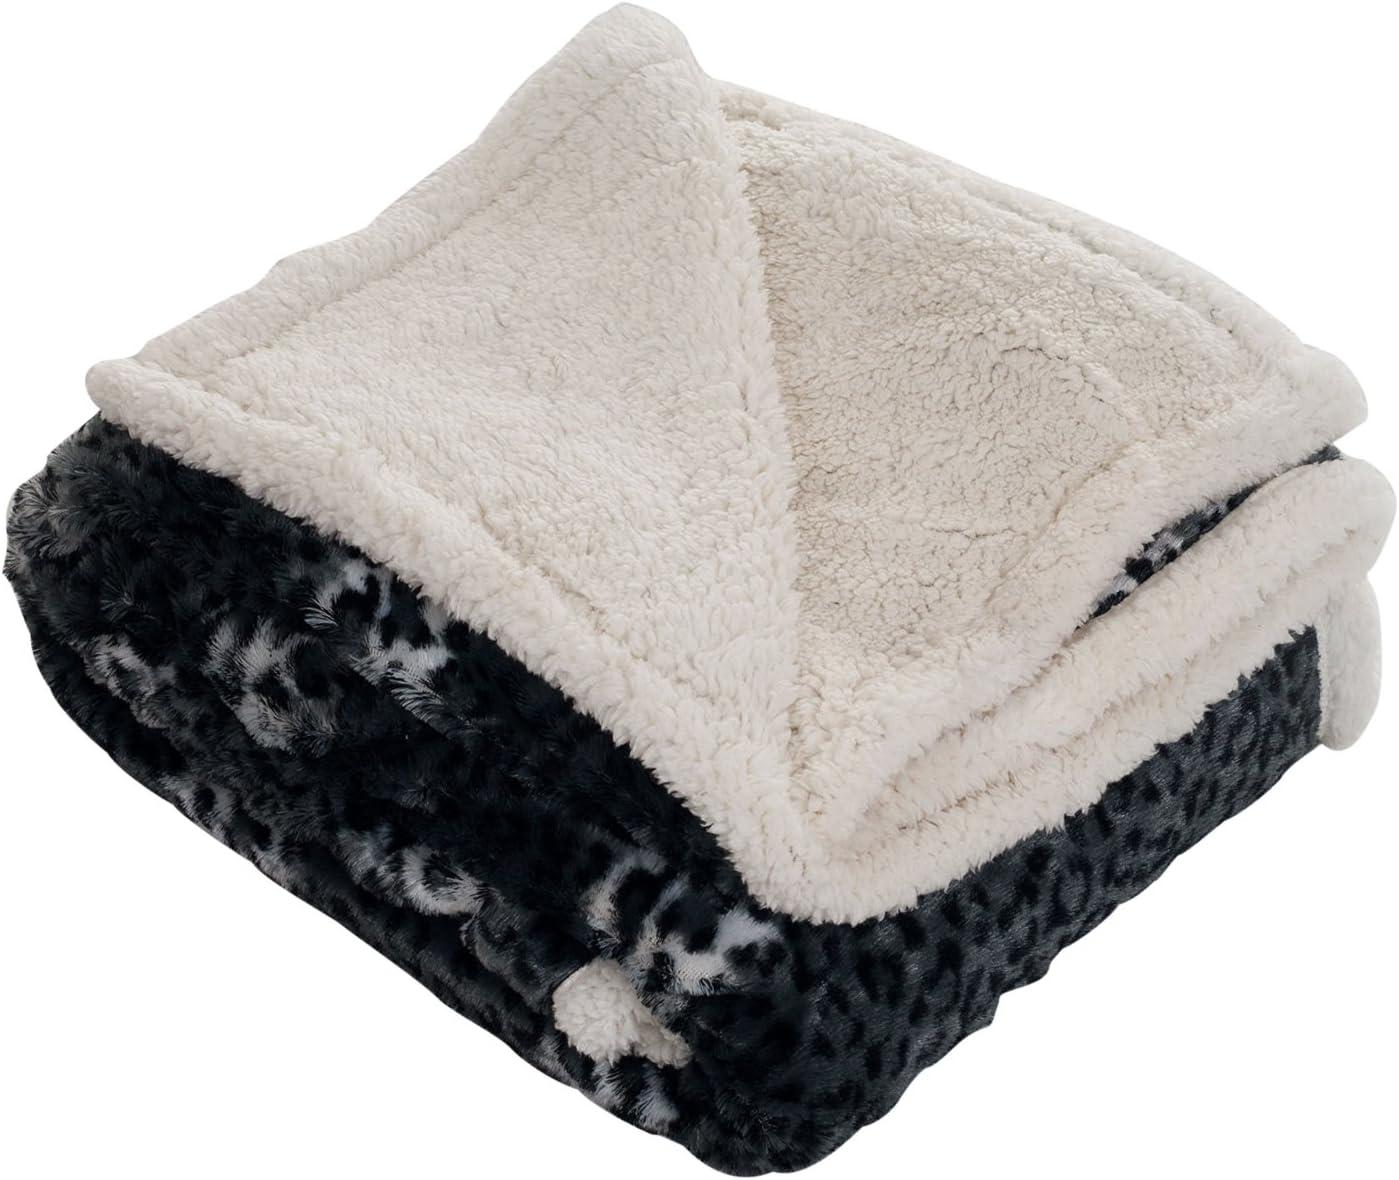 Bedford Home Cheetah Throw Blanket-Fleece/Sherpa